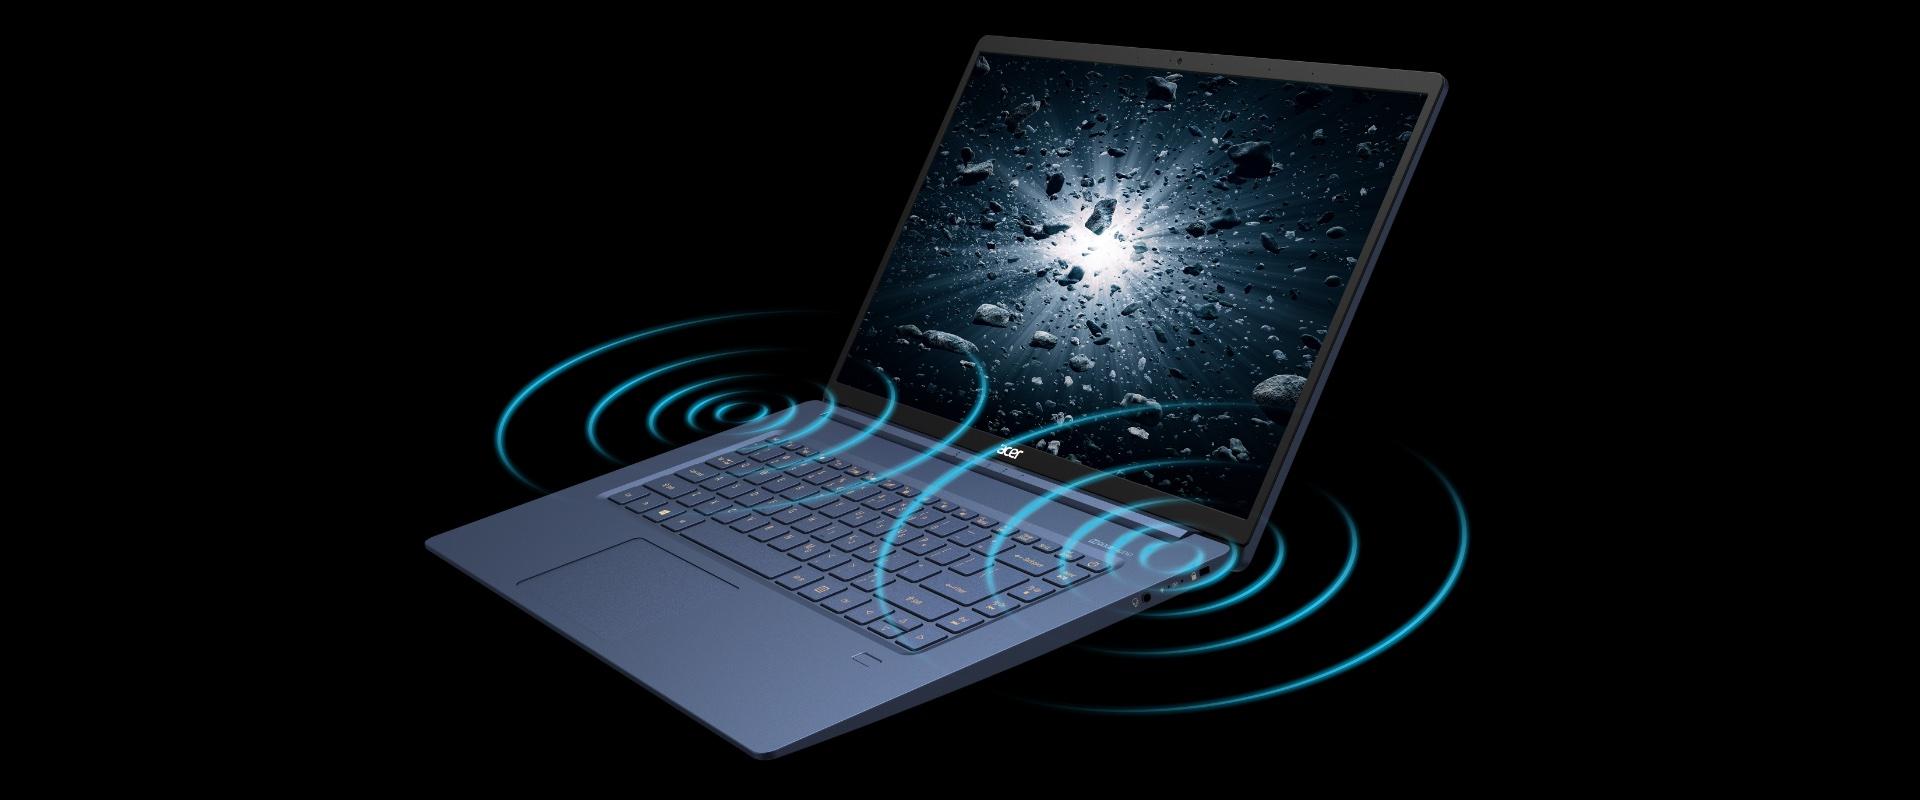 Acer Swift 5 UltraThin Charcoal Blue